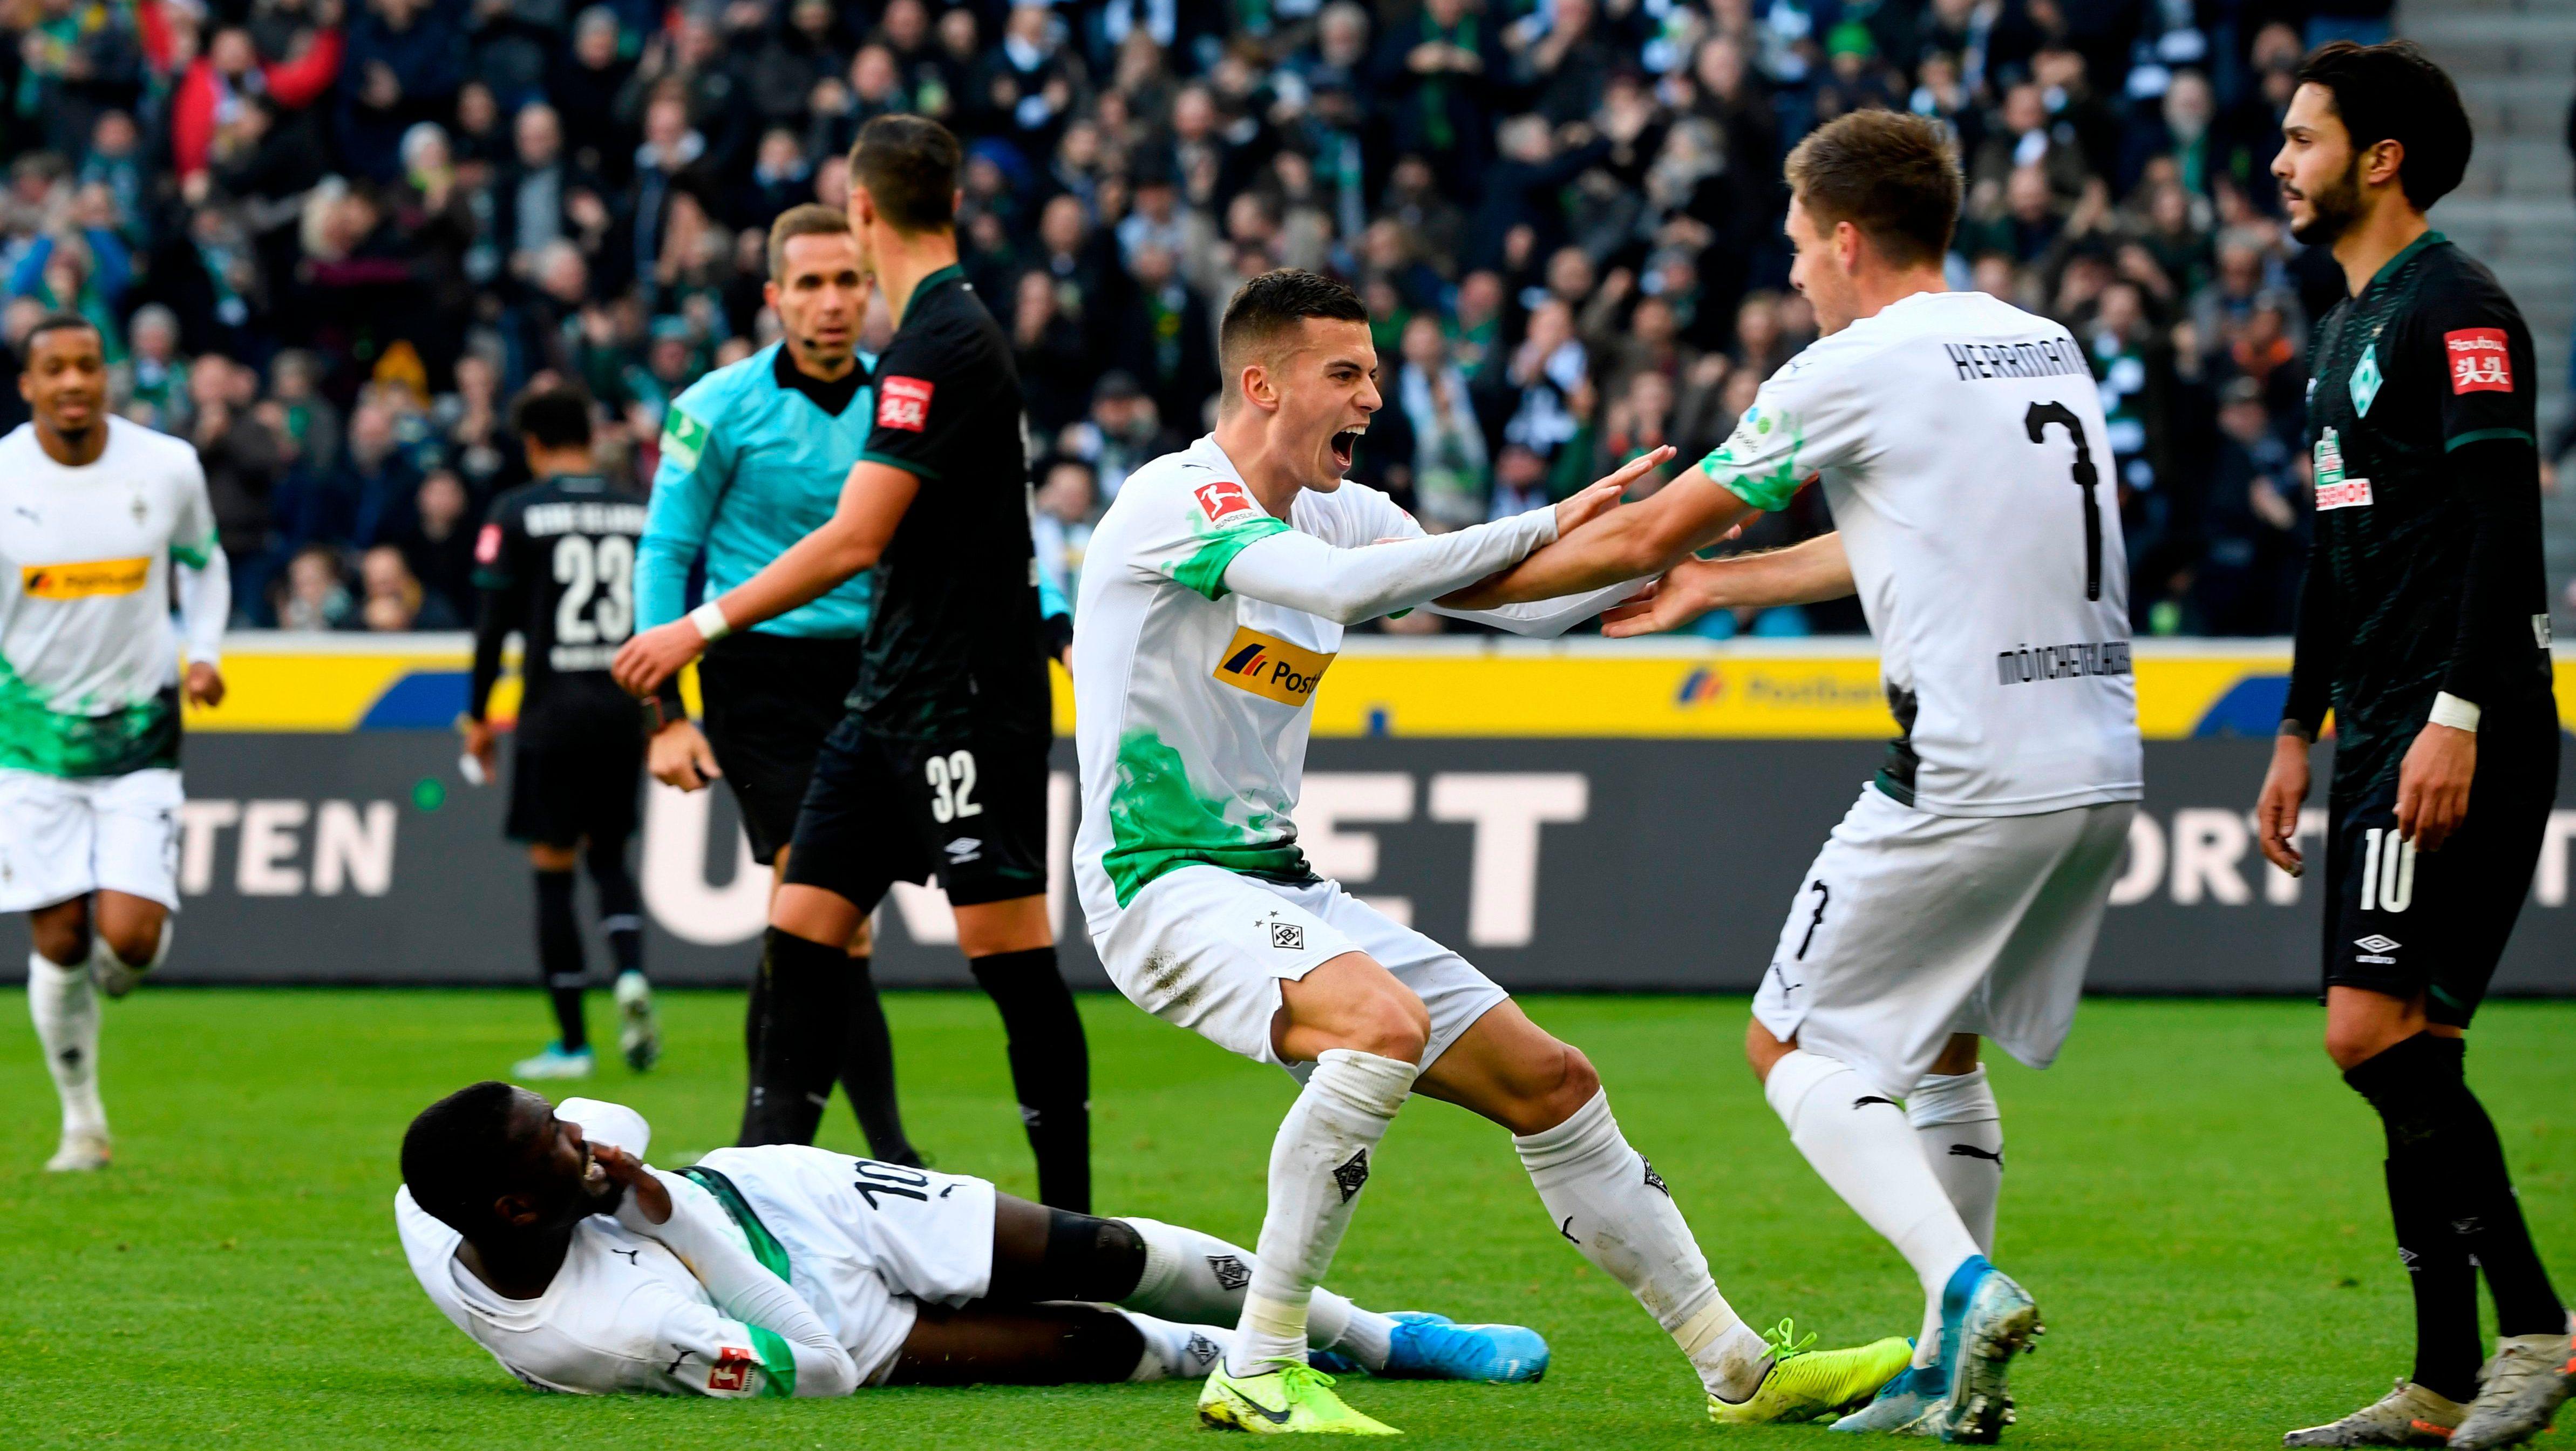 Gladbach stay top after Bremen win